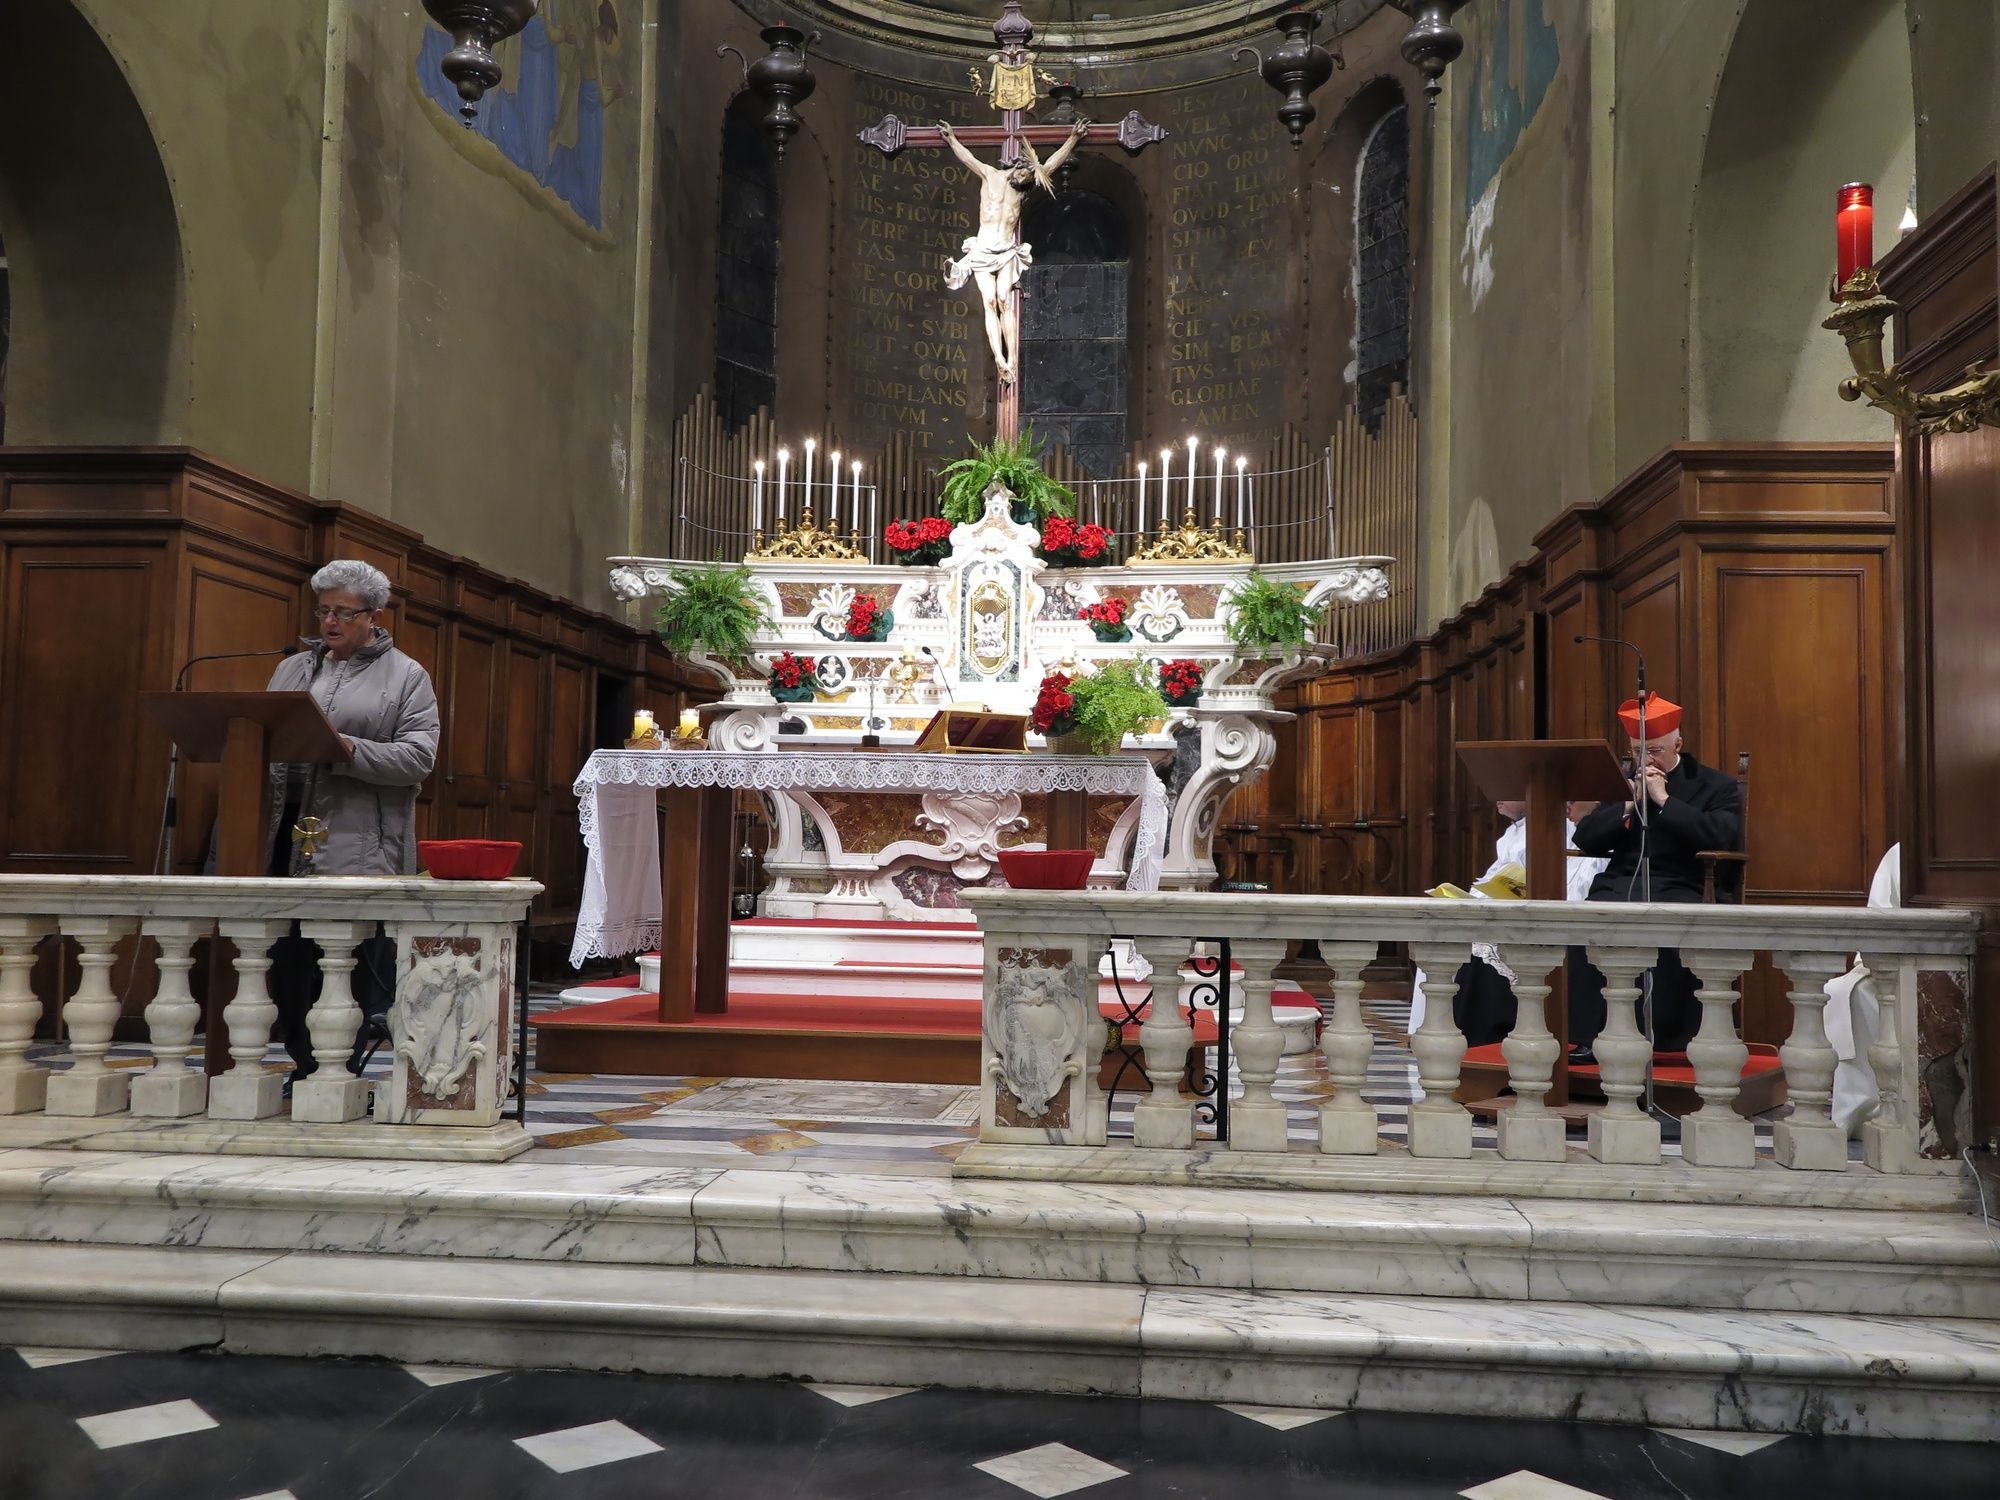 veglia-martiri-missionari-sturla-2016-04-02-21-11-11